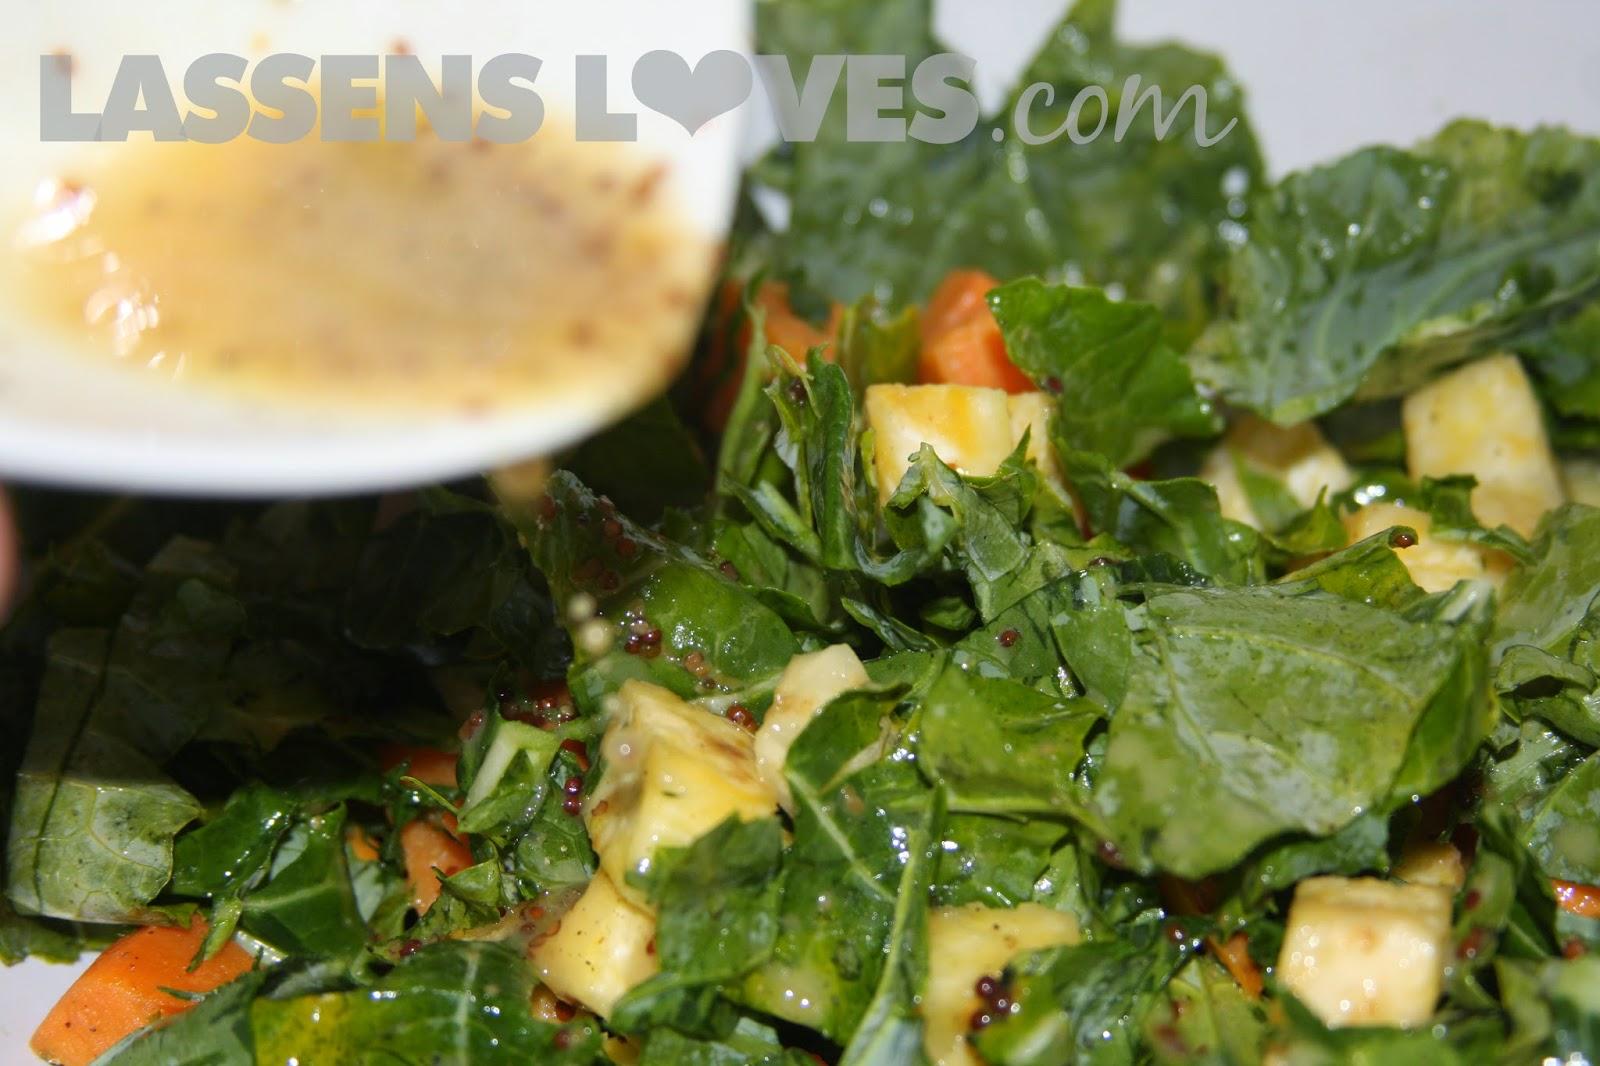 organic+produce, organic+broccoleaf, broccoleaf+recipes